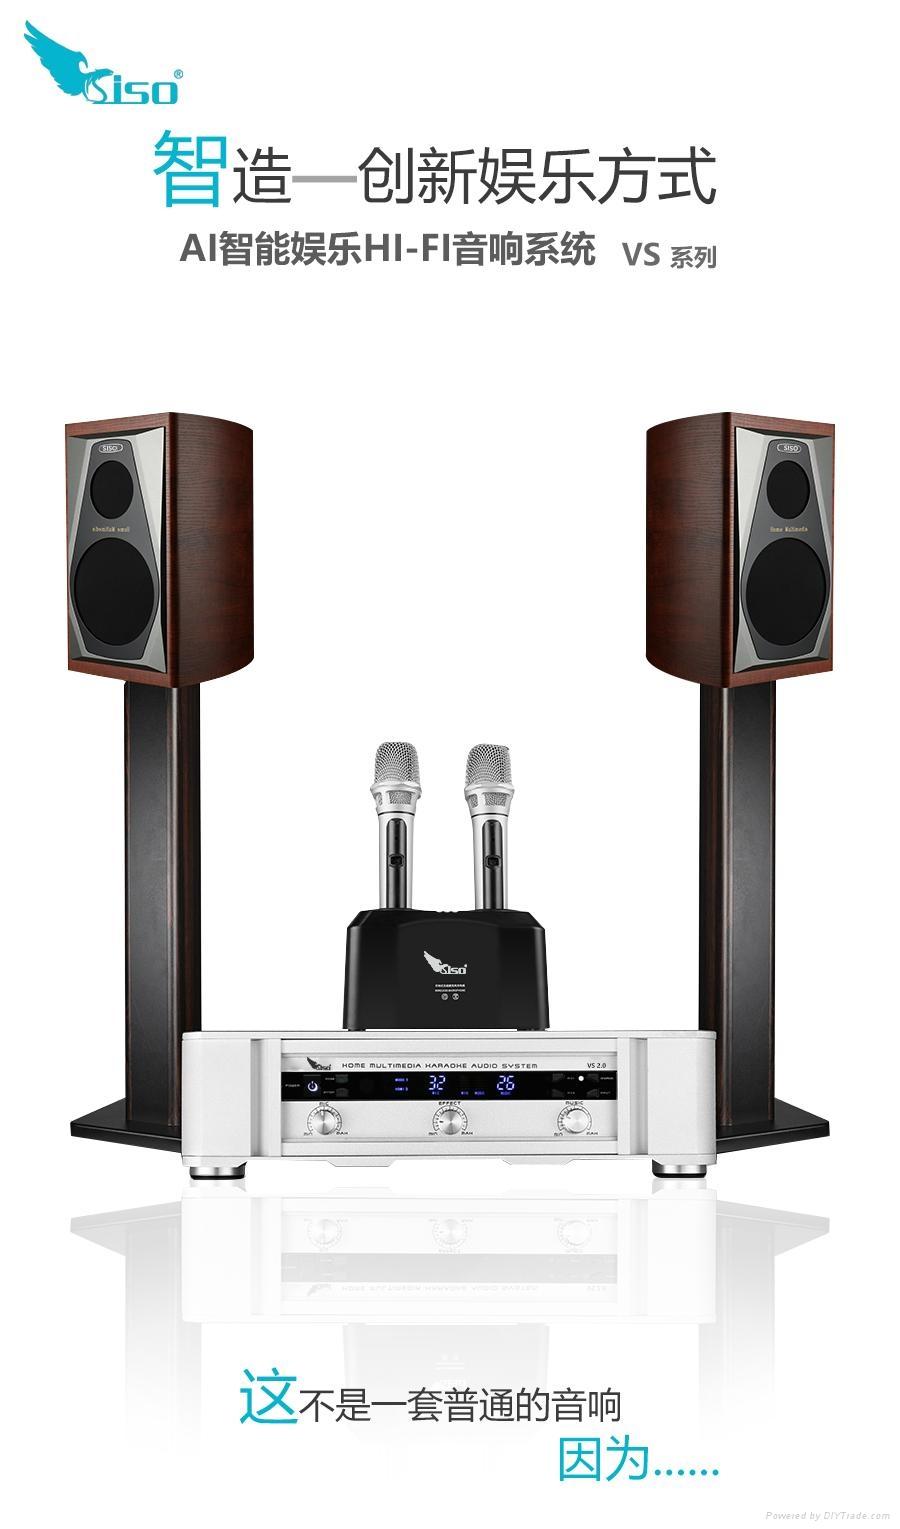 SISO音響智能系統AI語音系統K歌套裝 1